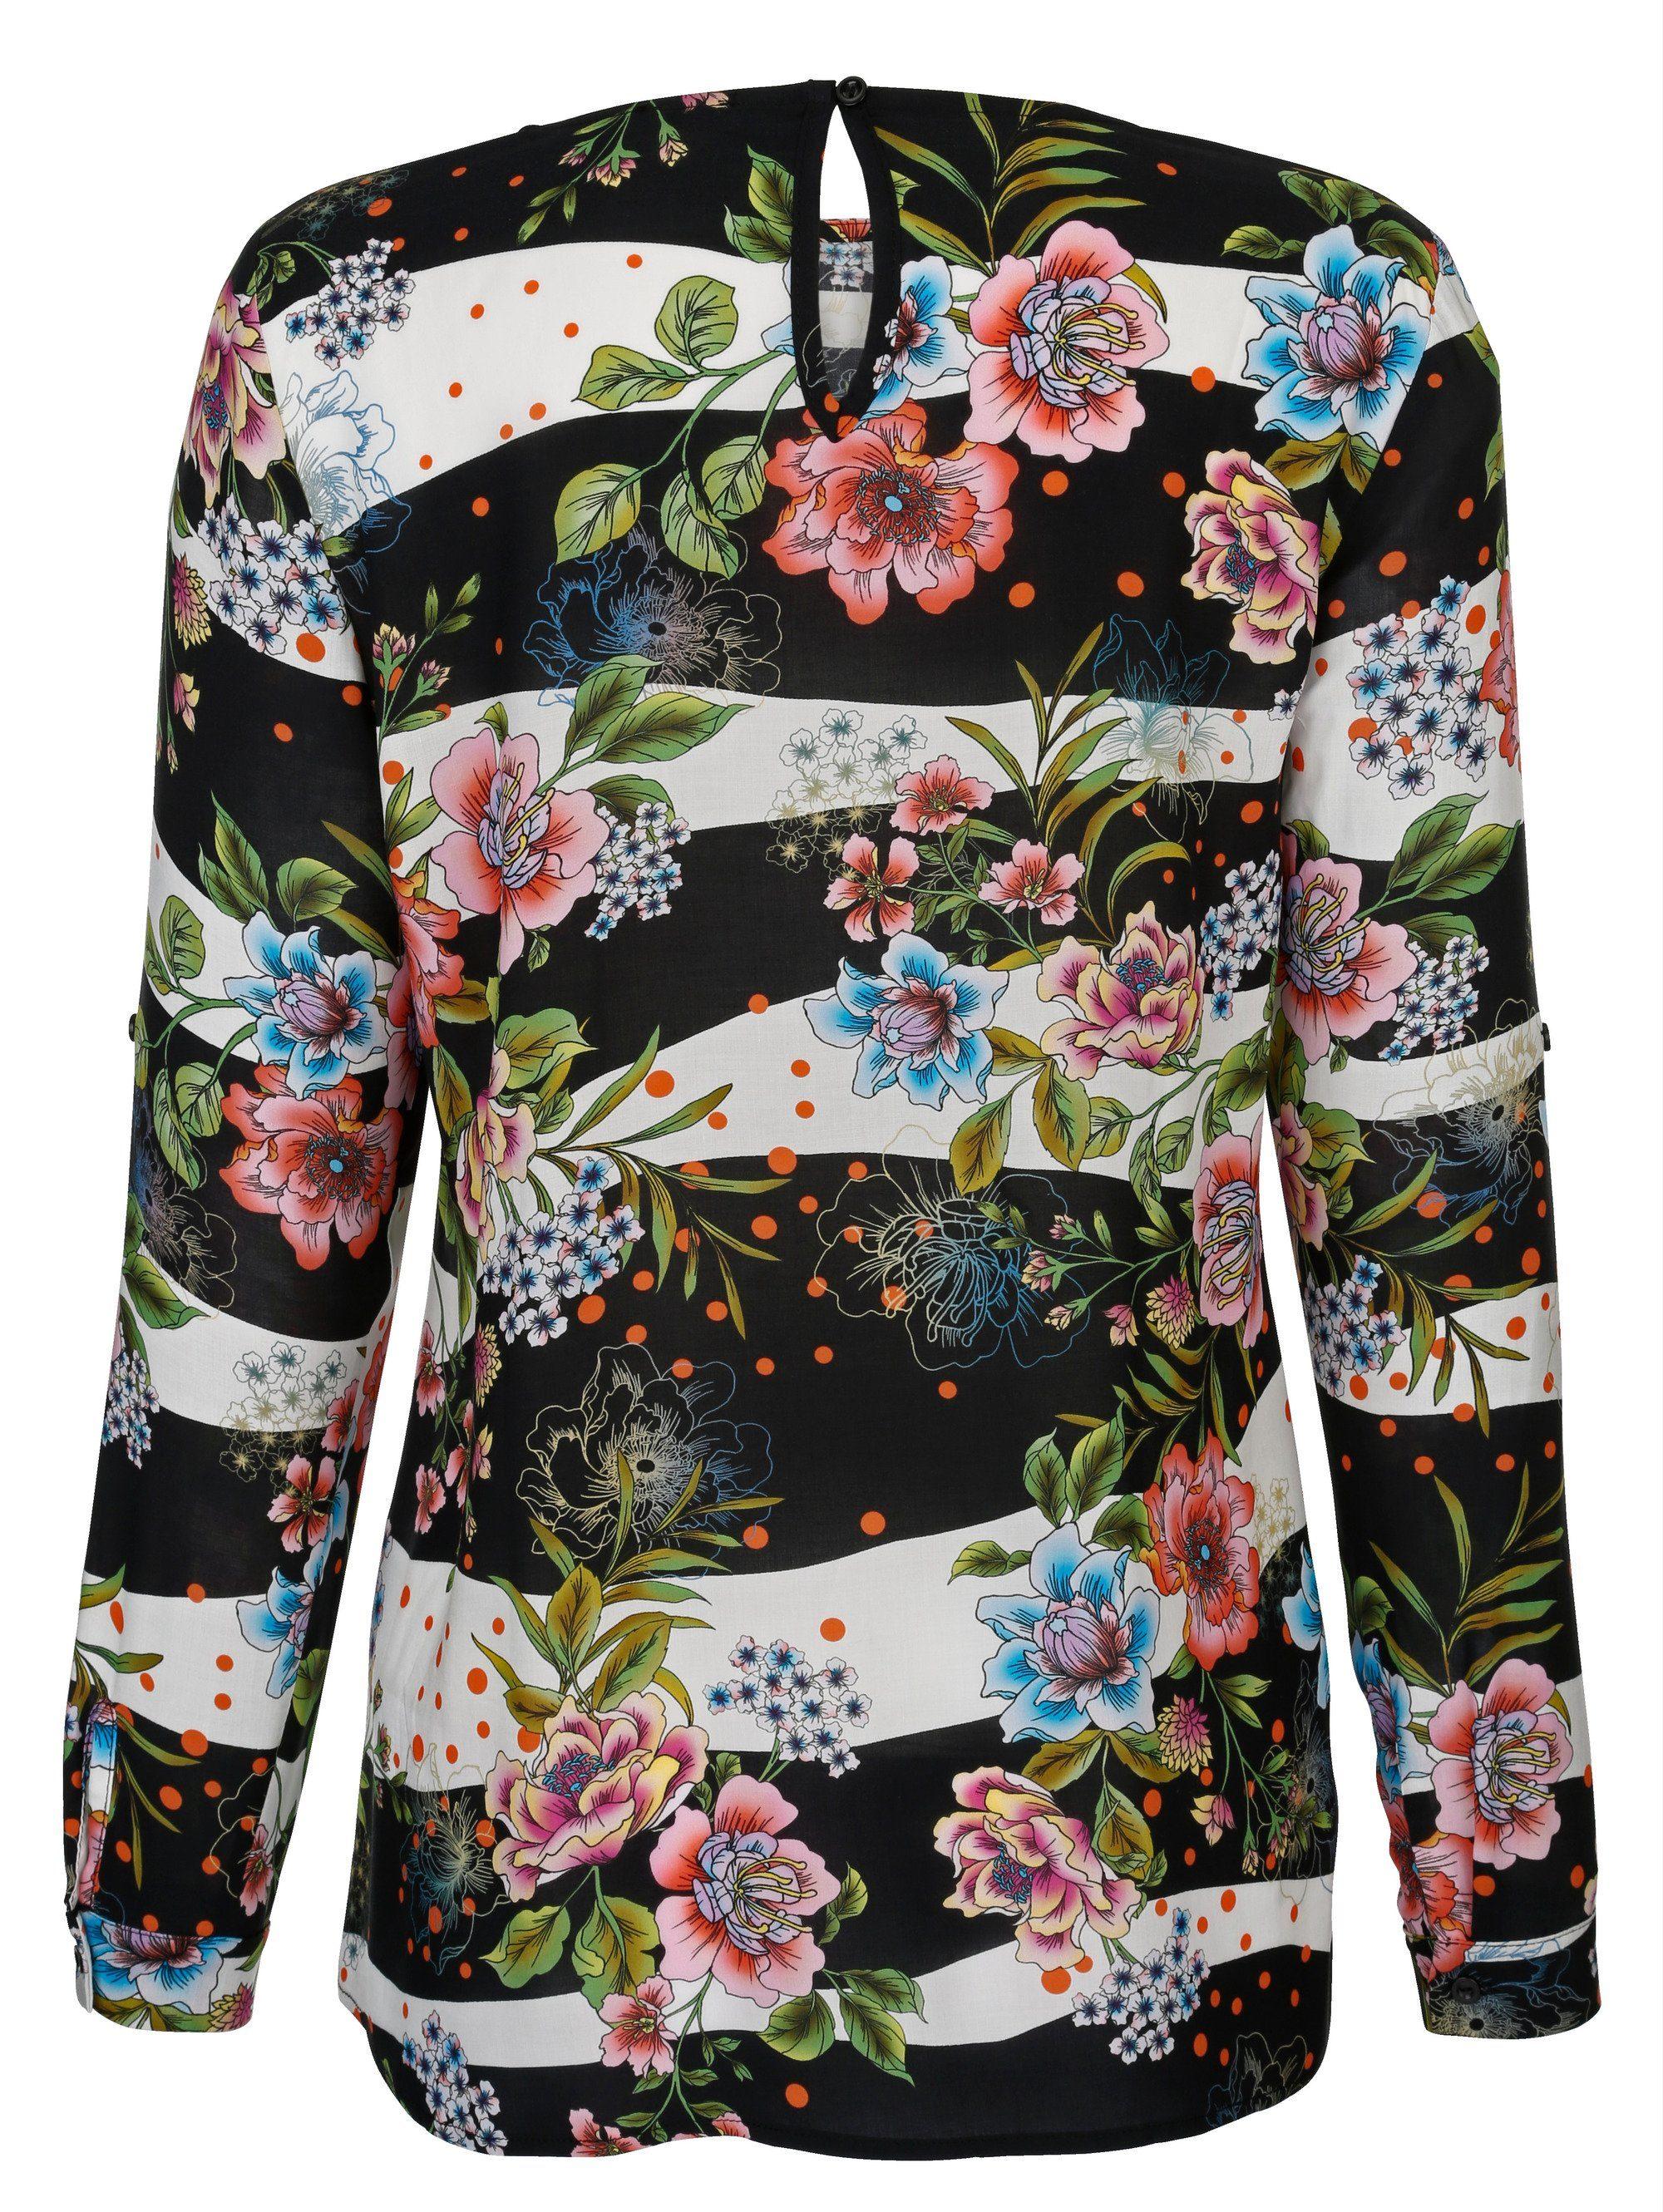 Alba Moda Bluse allover im ausdrucksstarken Blumenmuster